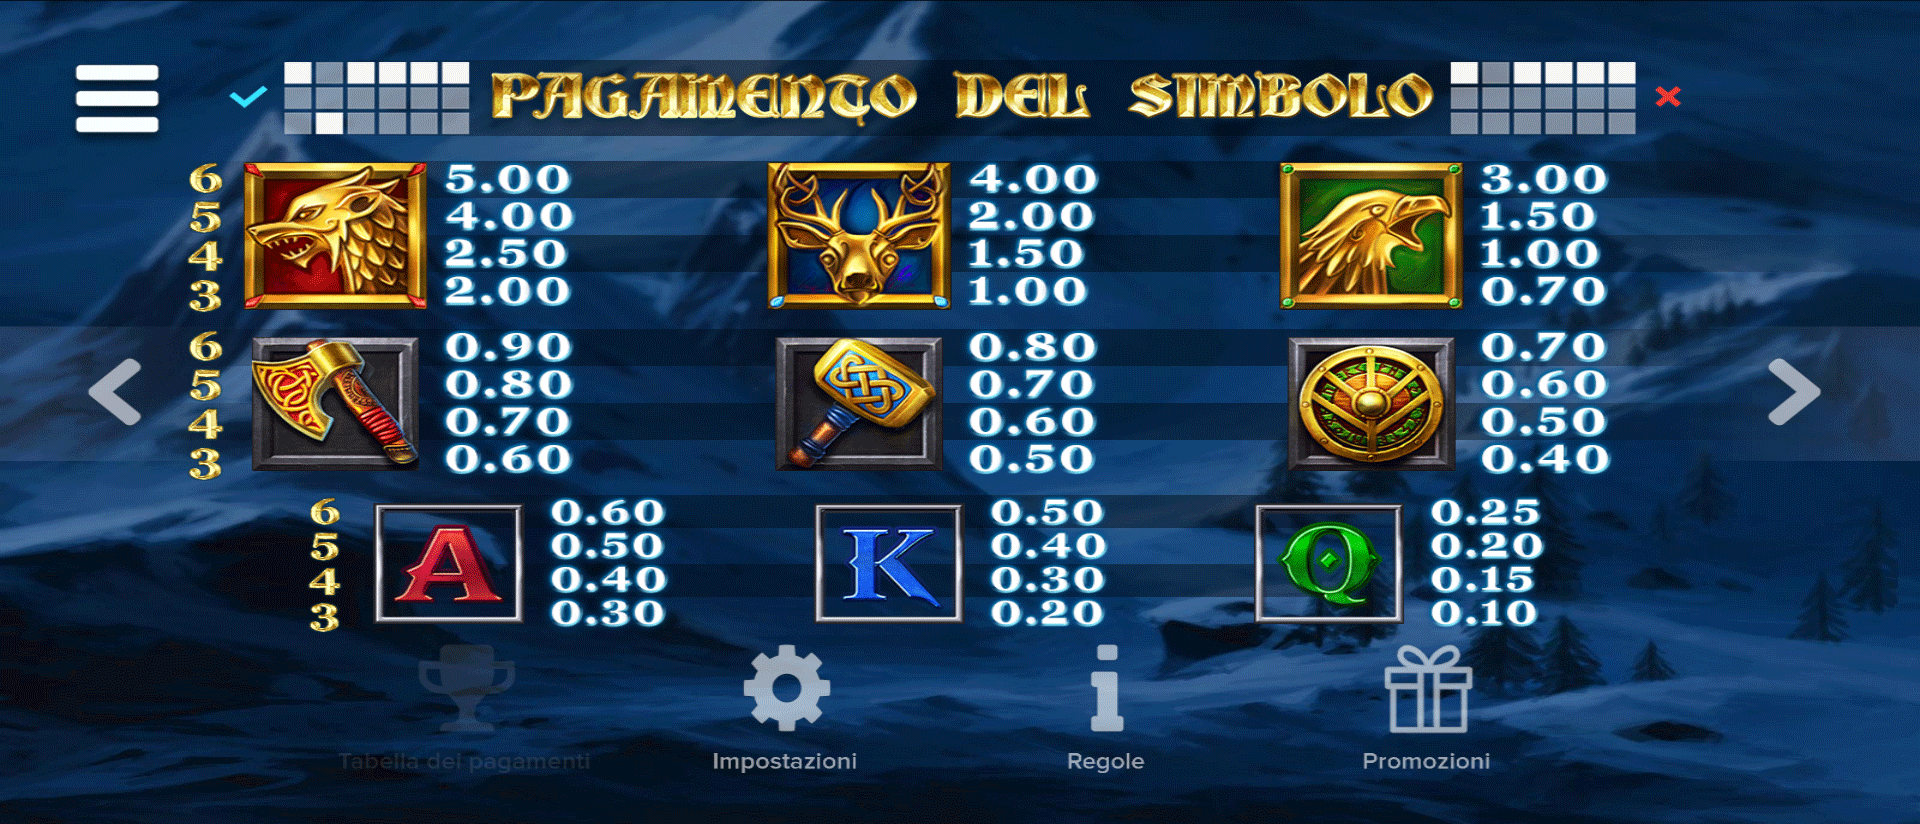 simboli della slot machine ice wolf